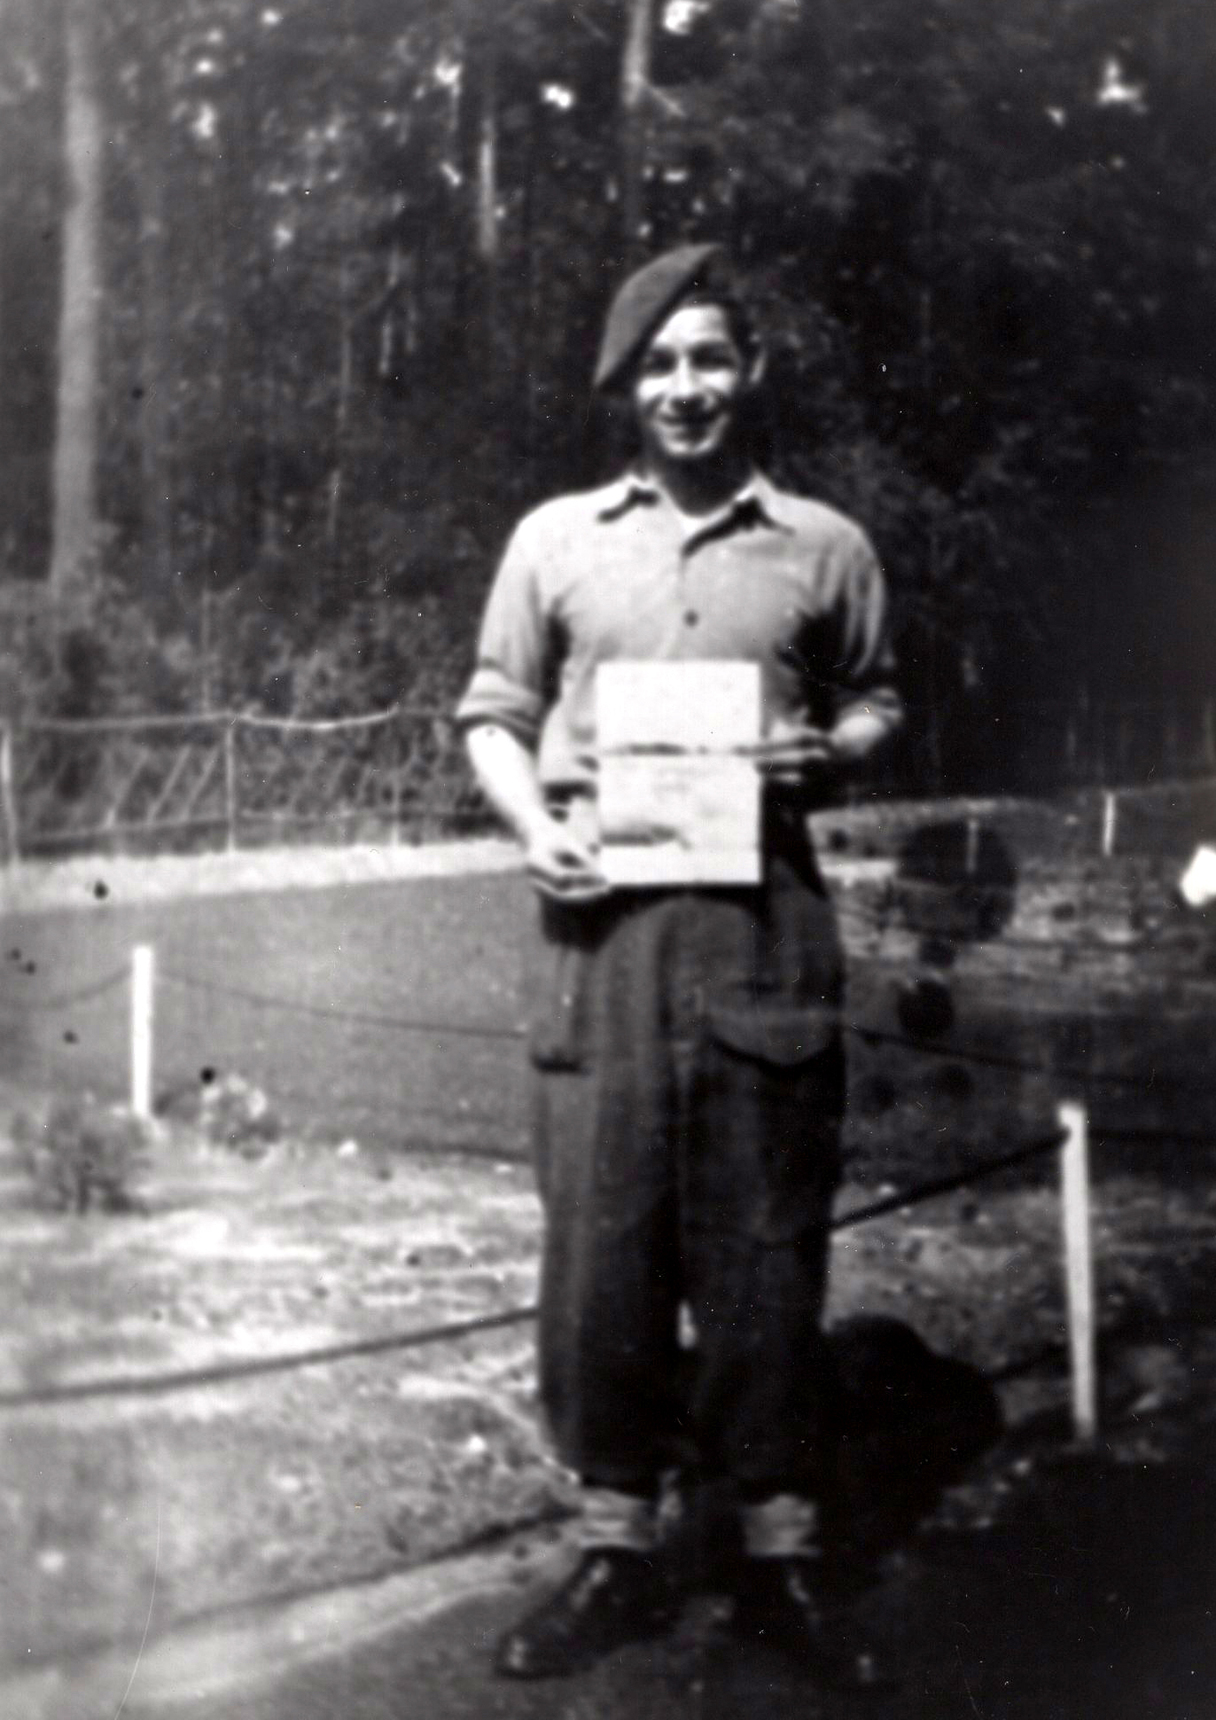 RAF Regiment Serviceman Holding Up Document, 8th Sept 1948